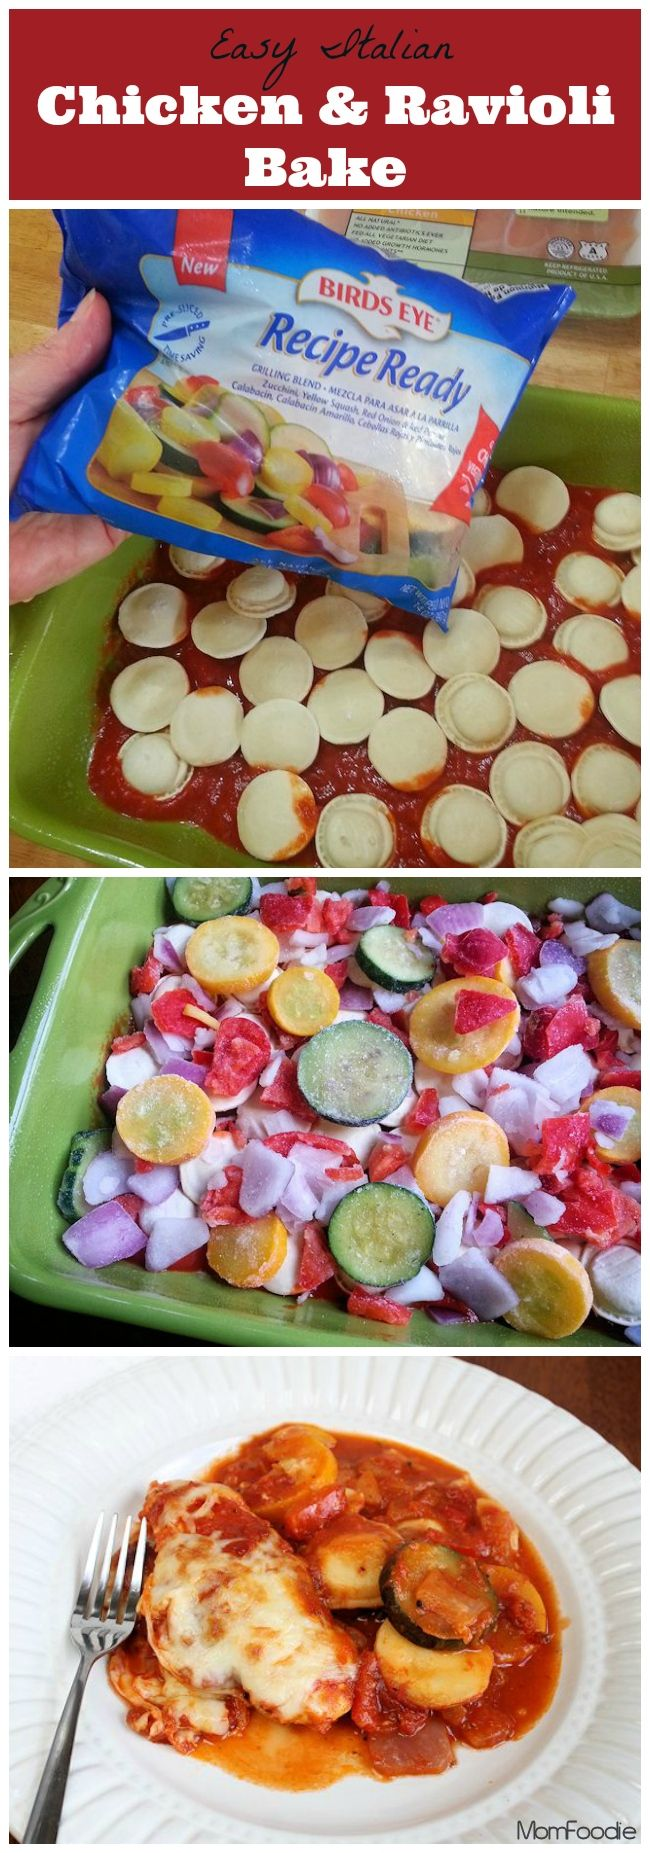 Easy Italian Chicken & Veggie Ravioli Bake - Mom Foodie